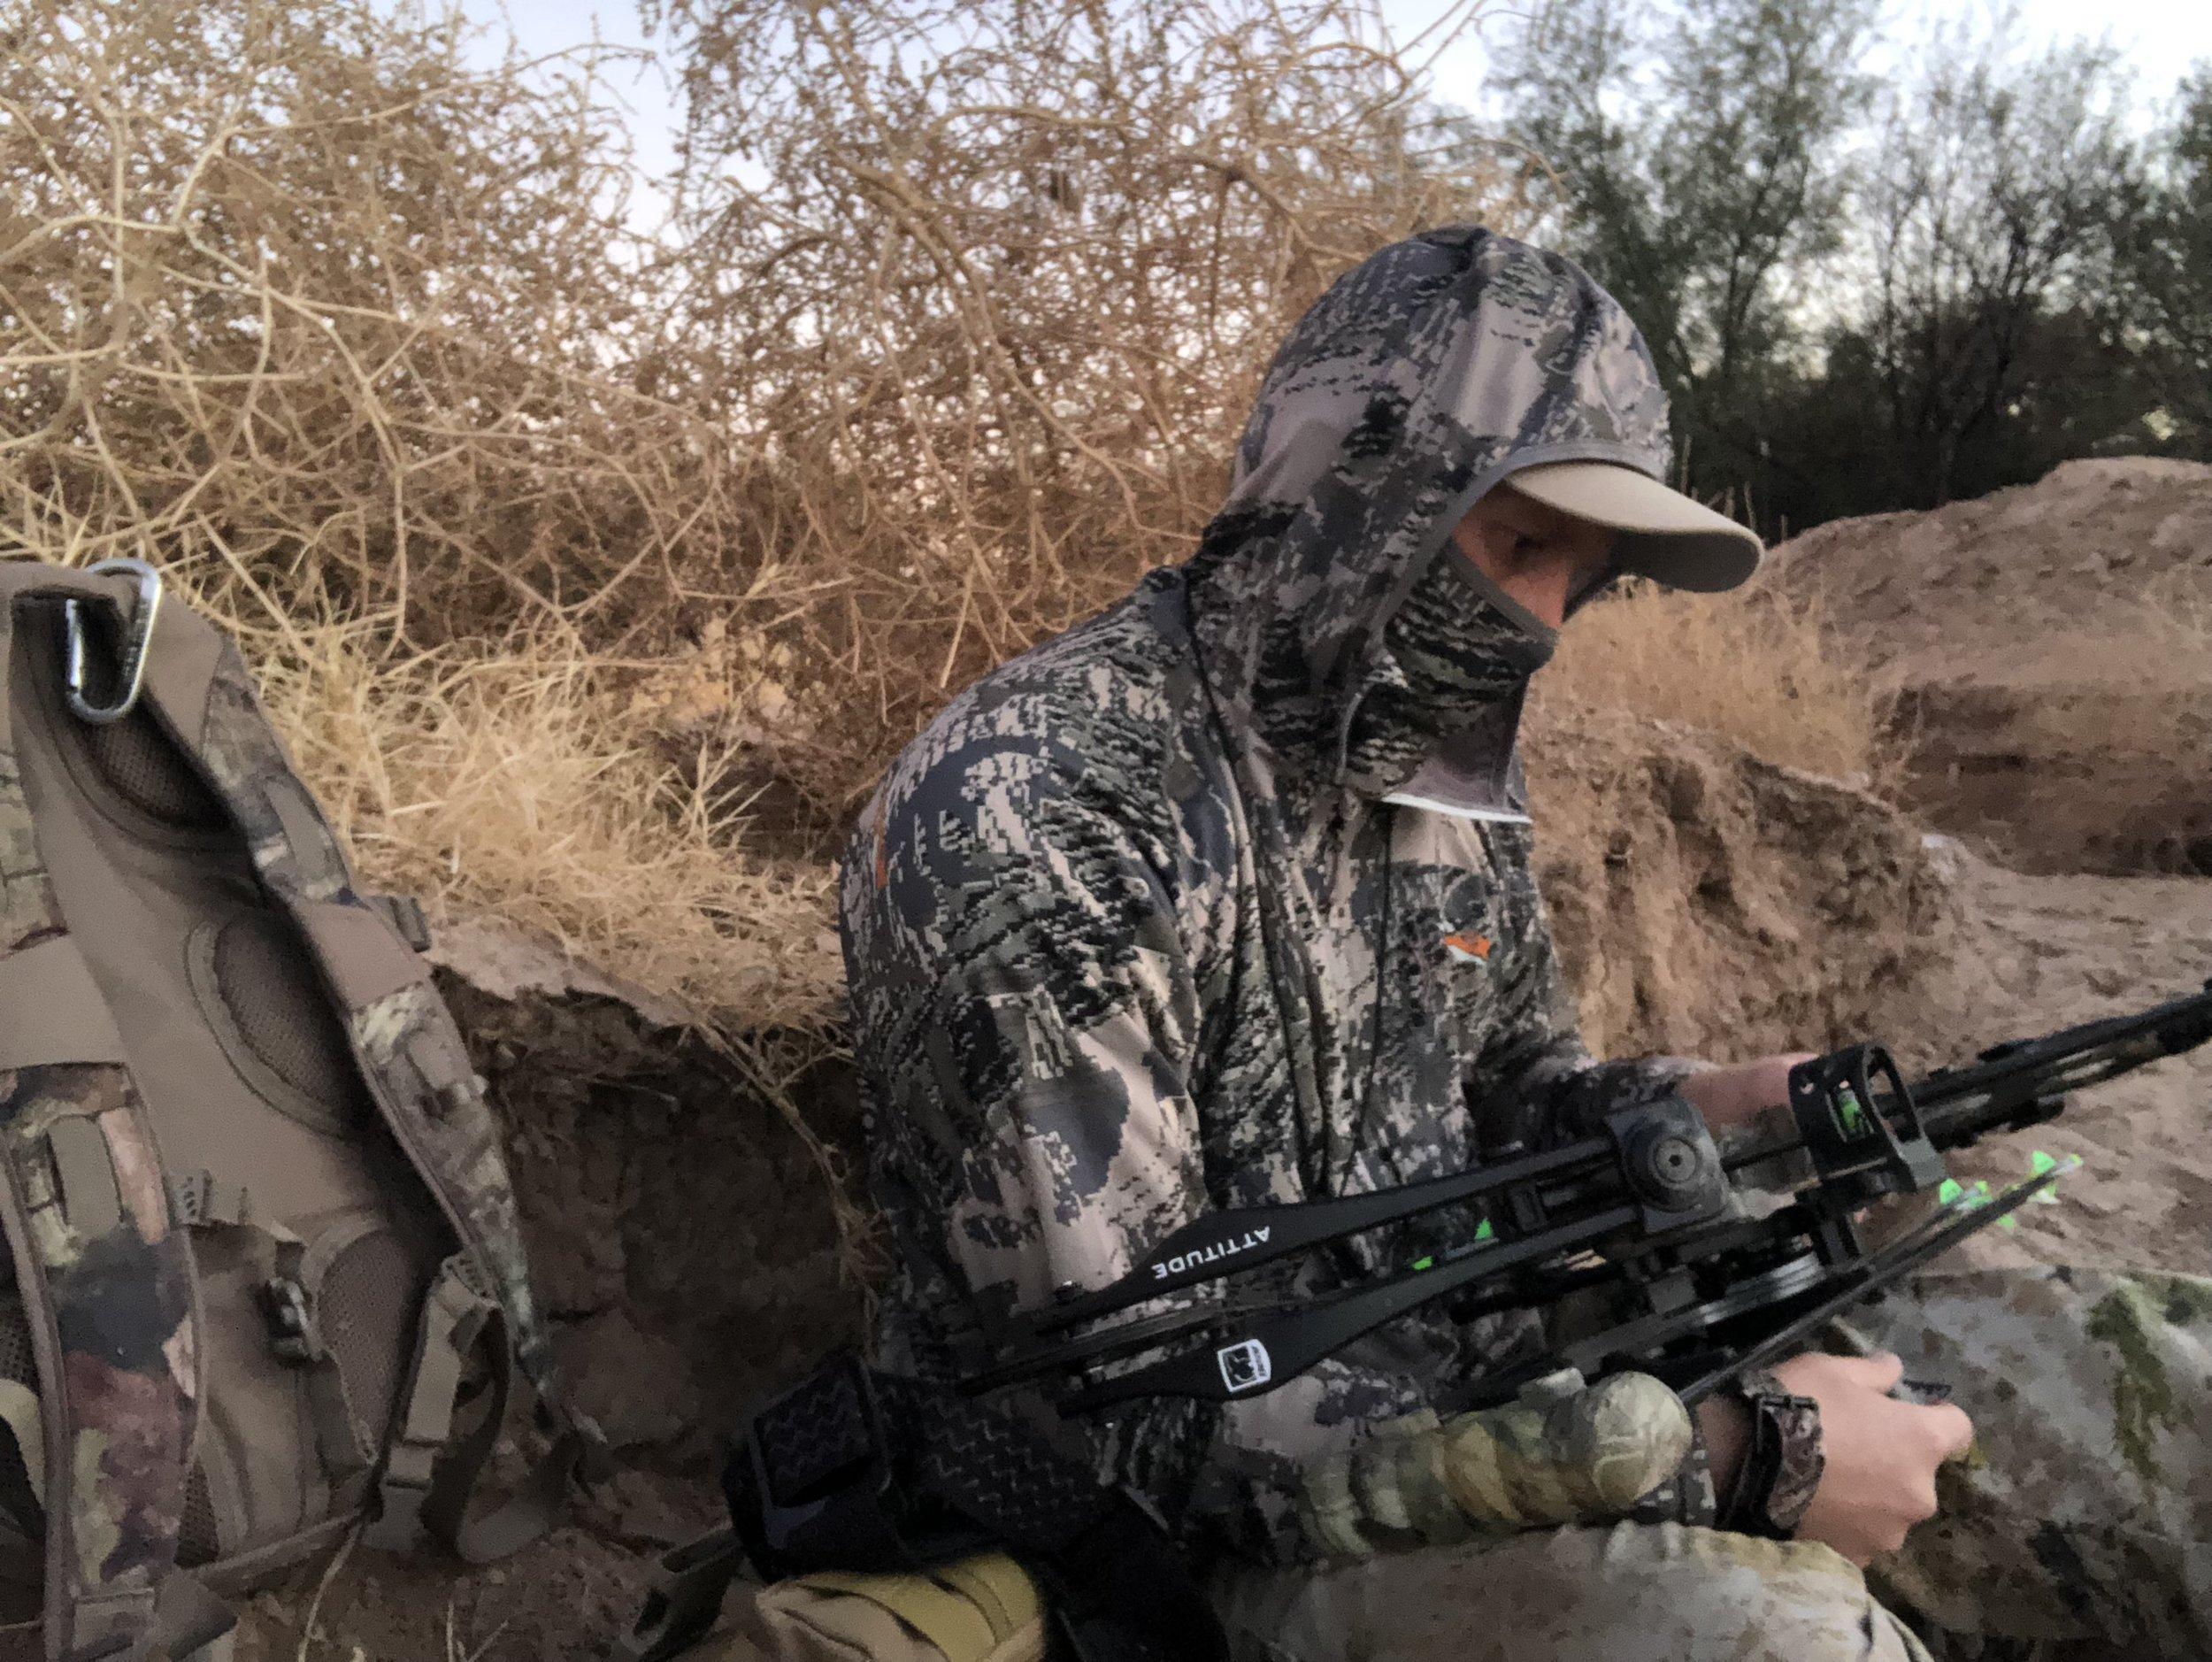 The despondent hunter contemplates his life...